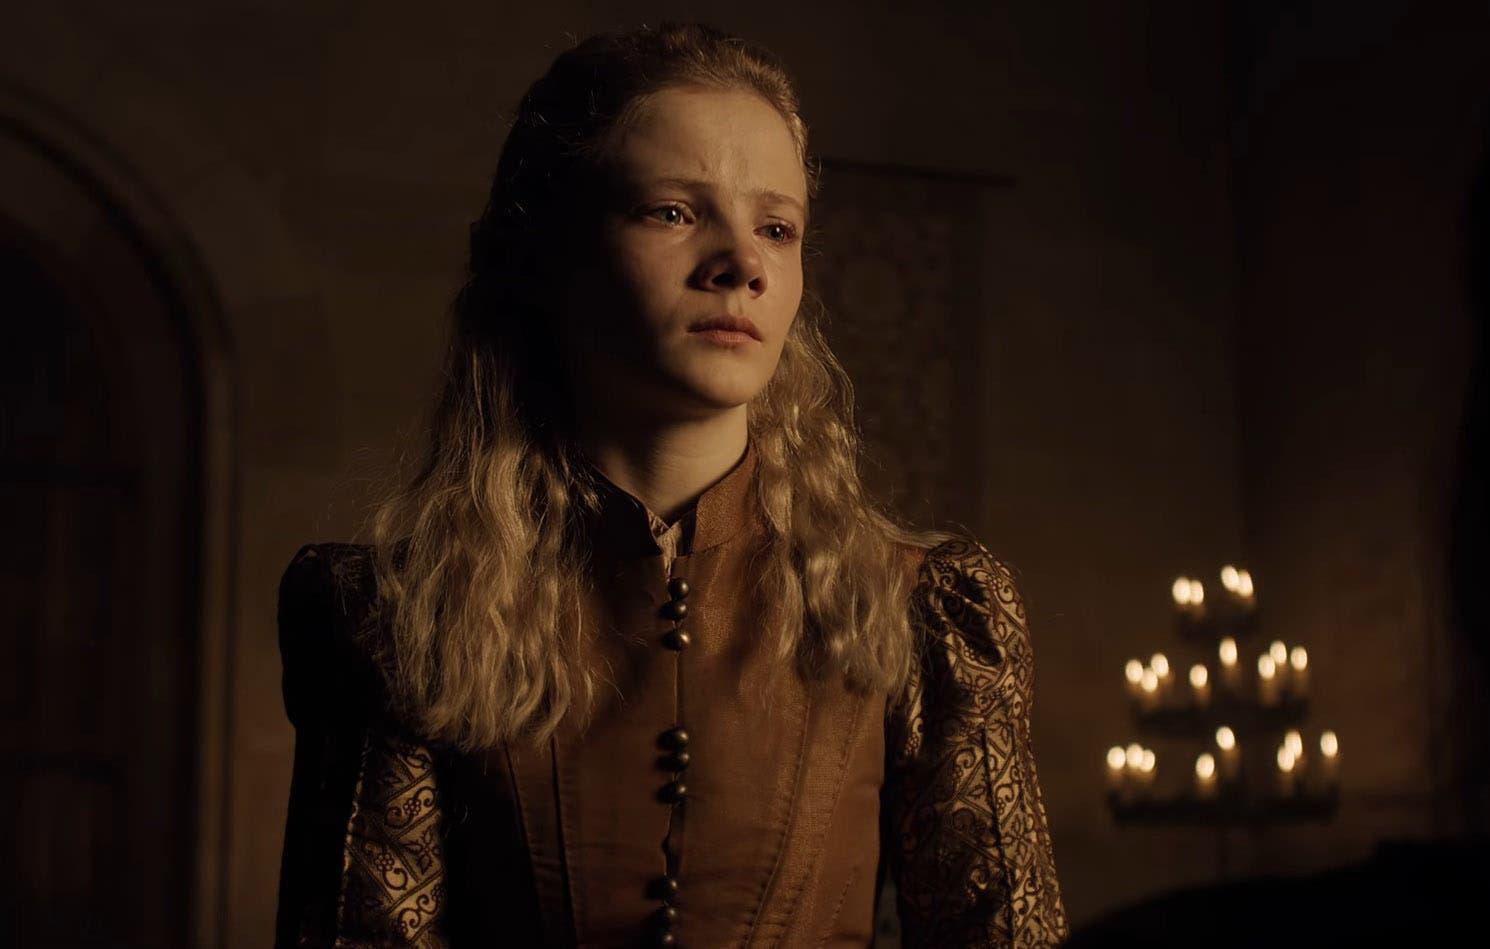 Ciri iba a ser la protagonista de la serie de The Witcher originalmente 4